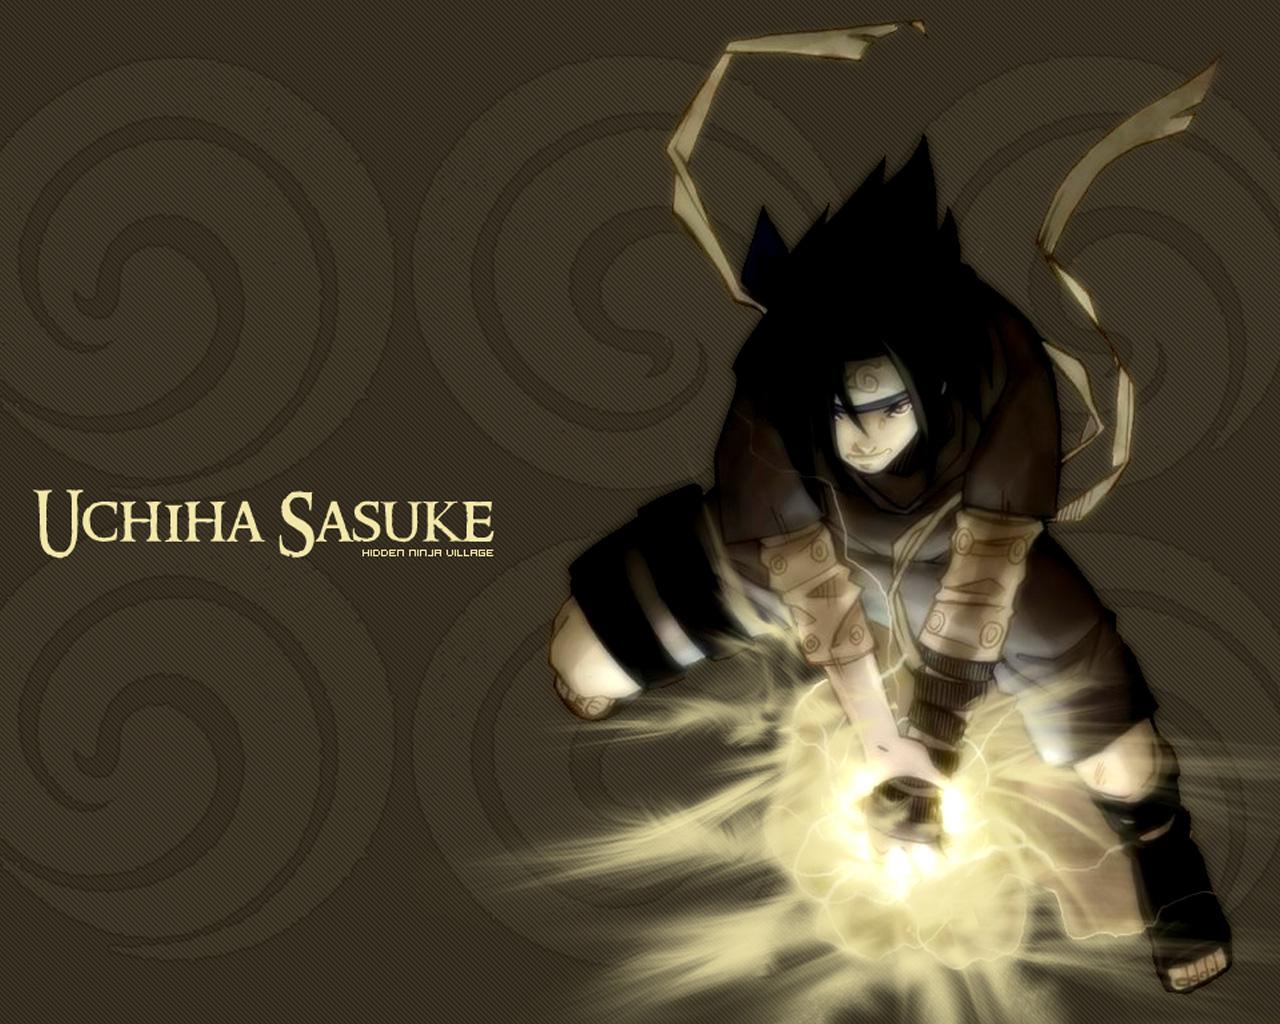 http://3.bp.blogspot.com/-bLPLeRSQSlk/TWzOj8ZZHrI/AAAAAAAABIg/zHyfYobz5cE/s1600/uchiha-sasuke-wallpaper.jpg